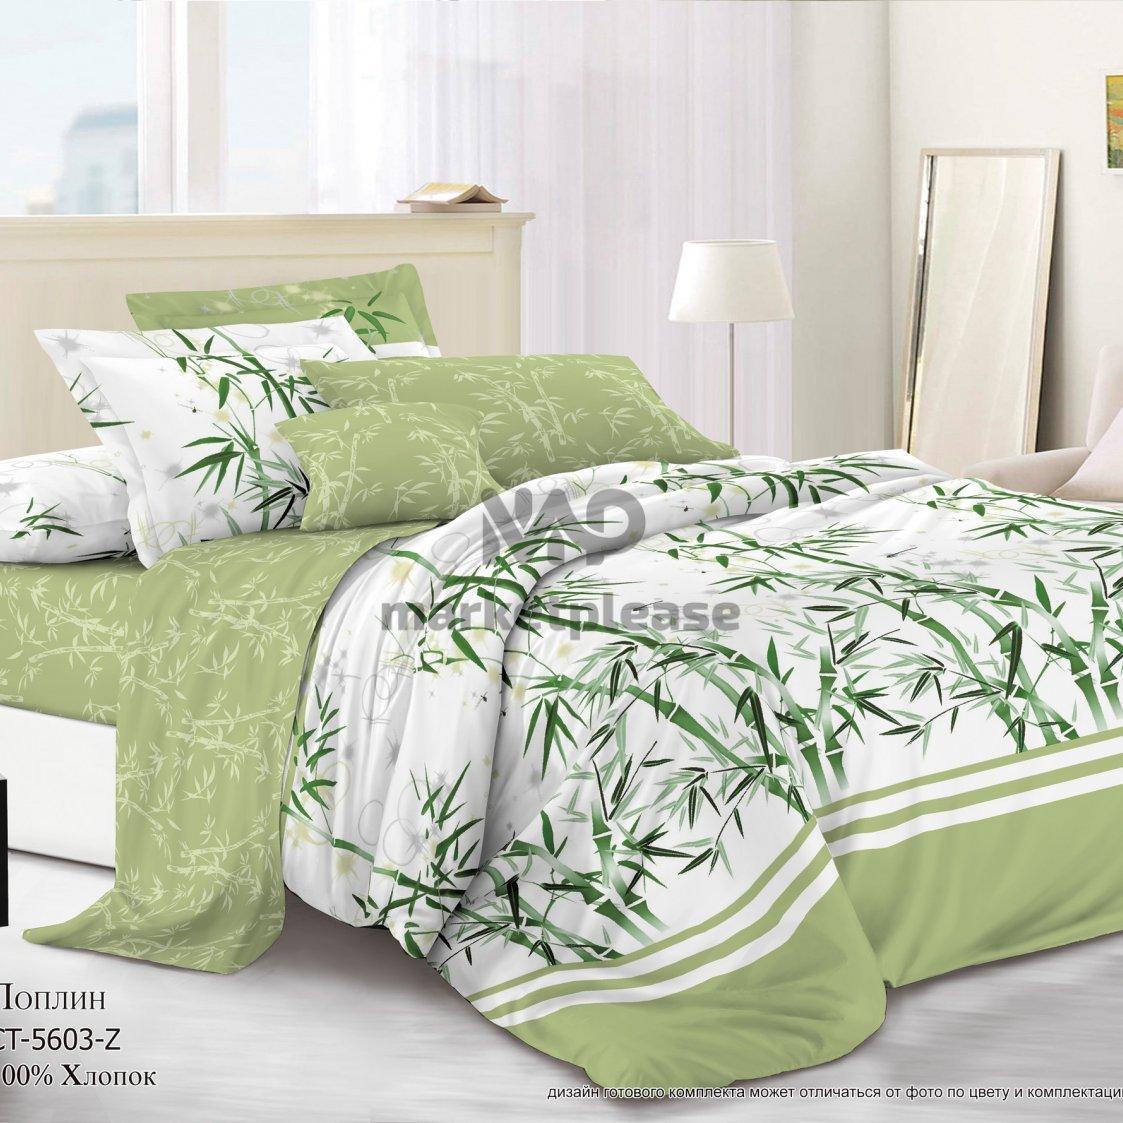 "Рулон ткани поплин ""СТ-5603-Z"" 220 см."